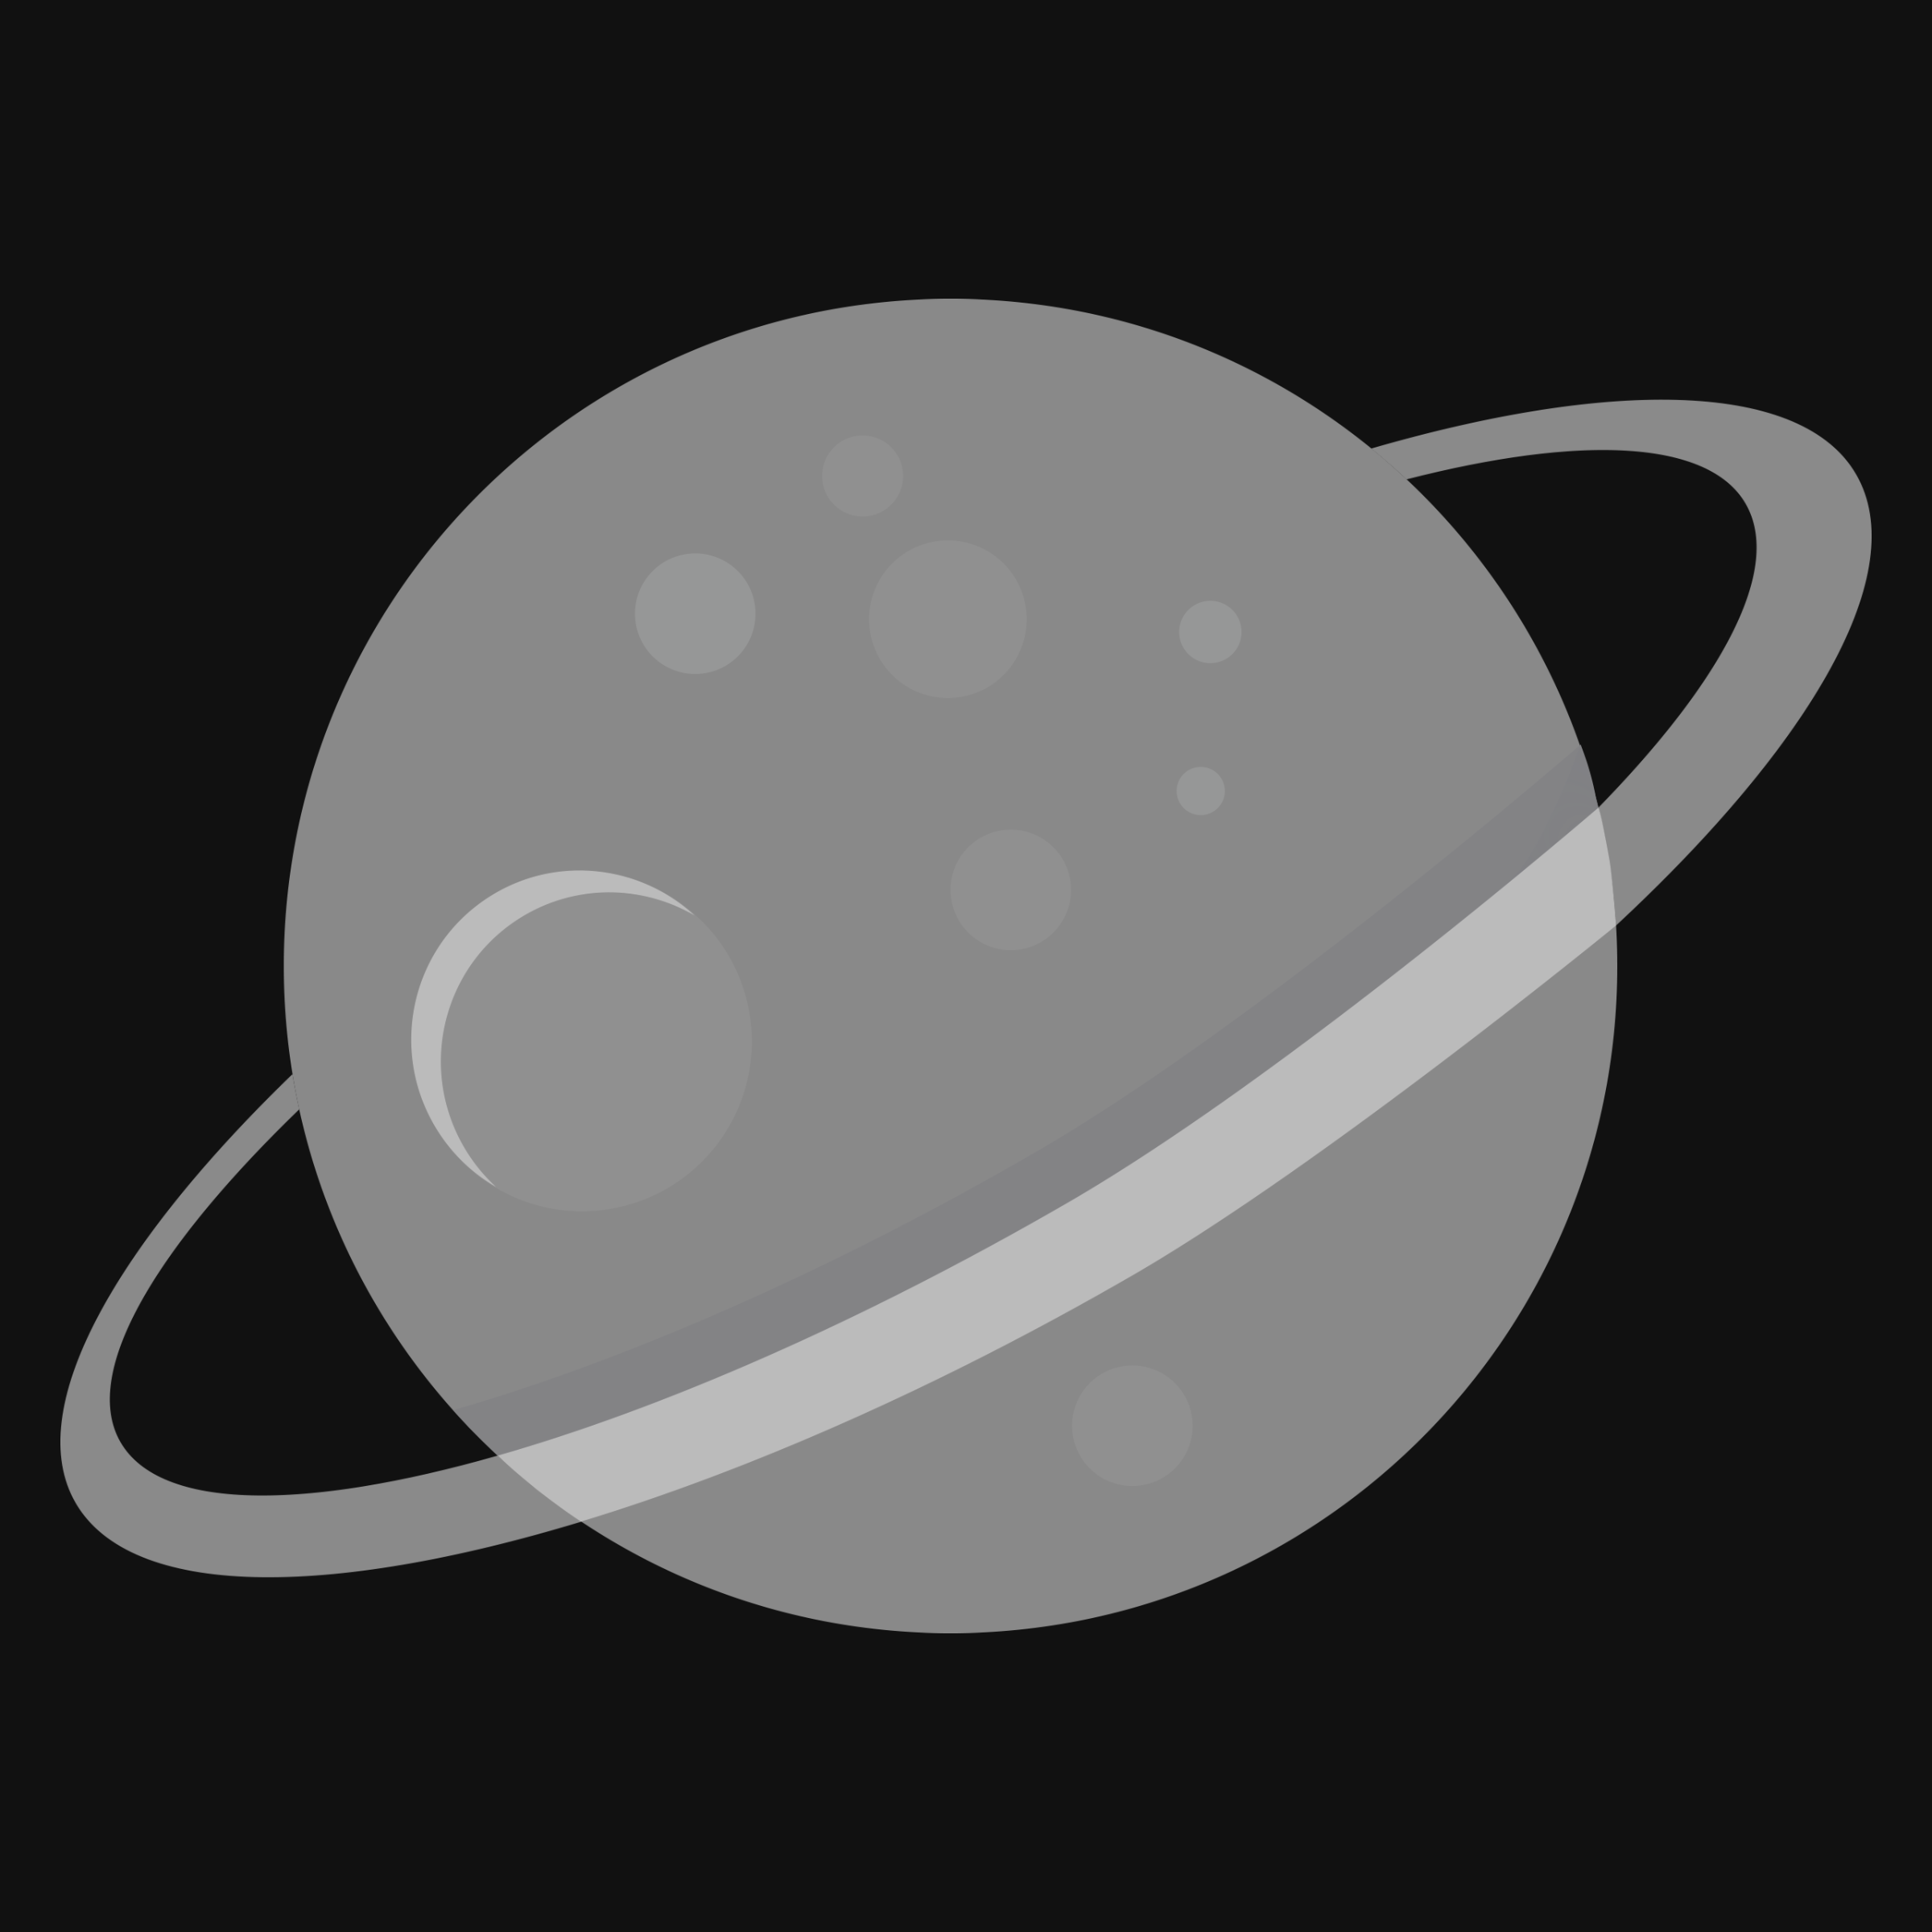 A Planet's Essence